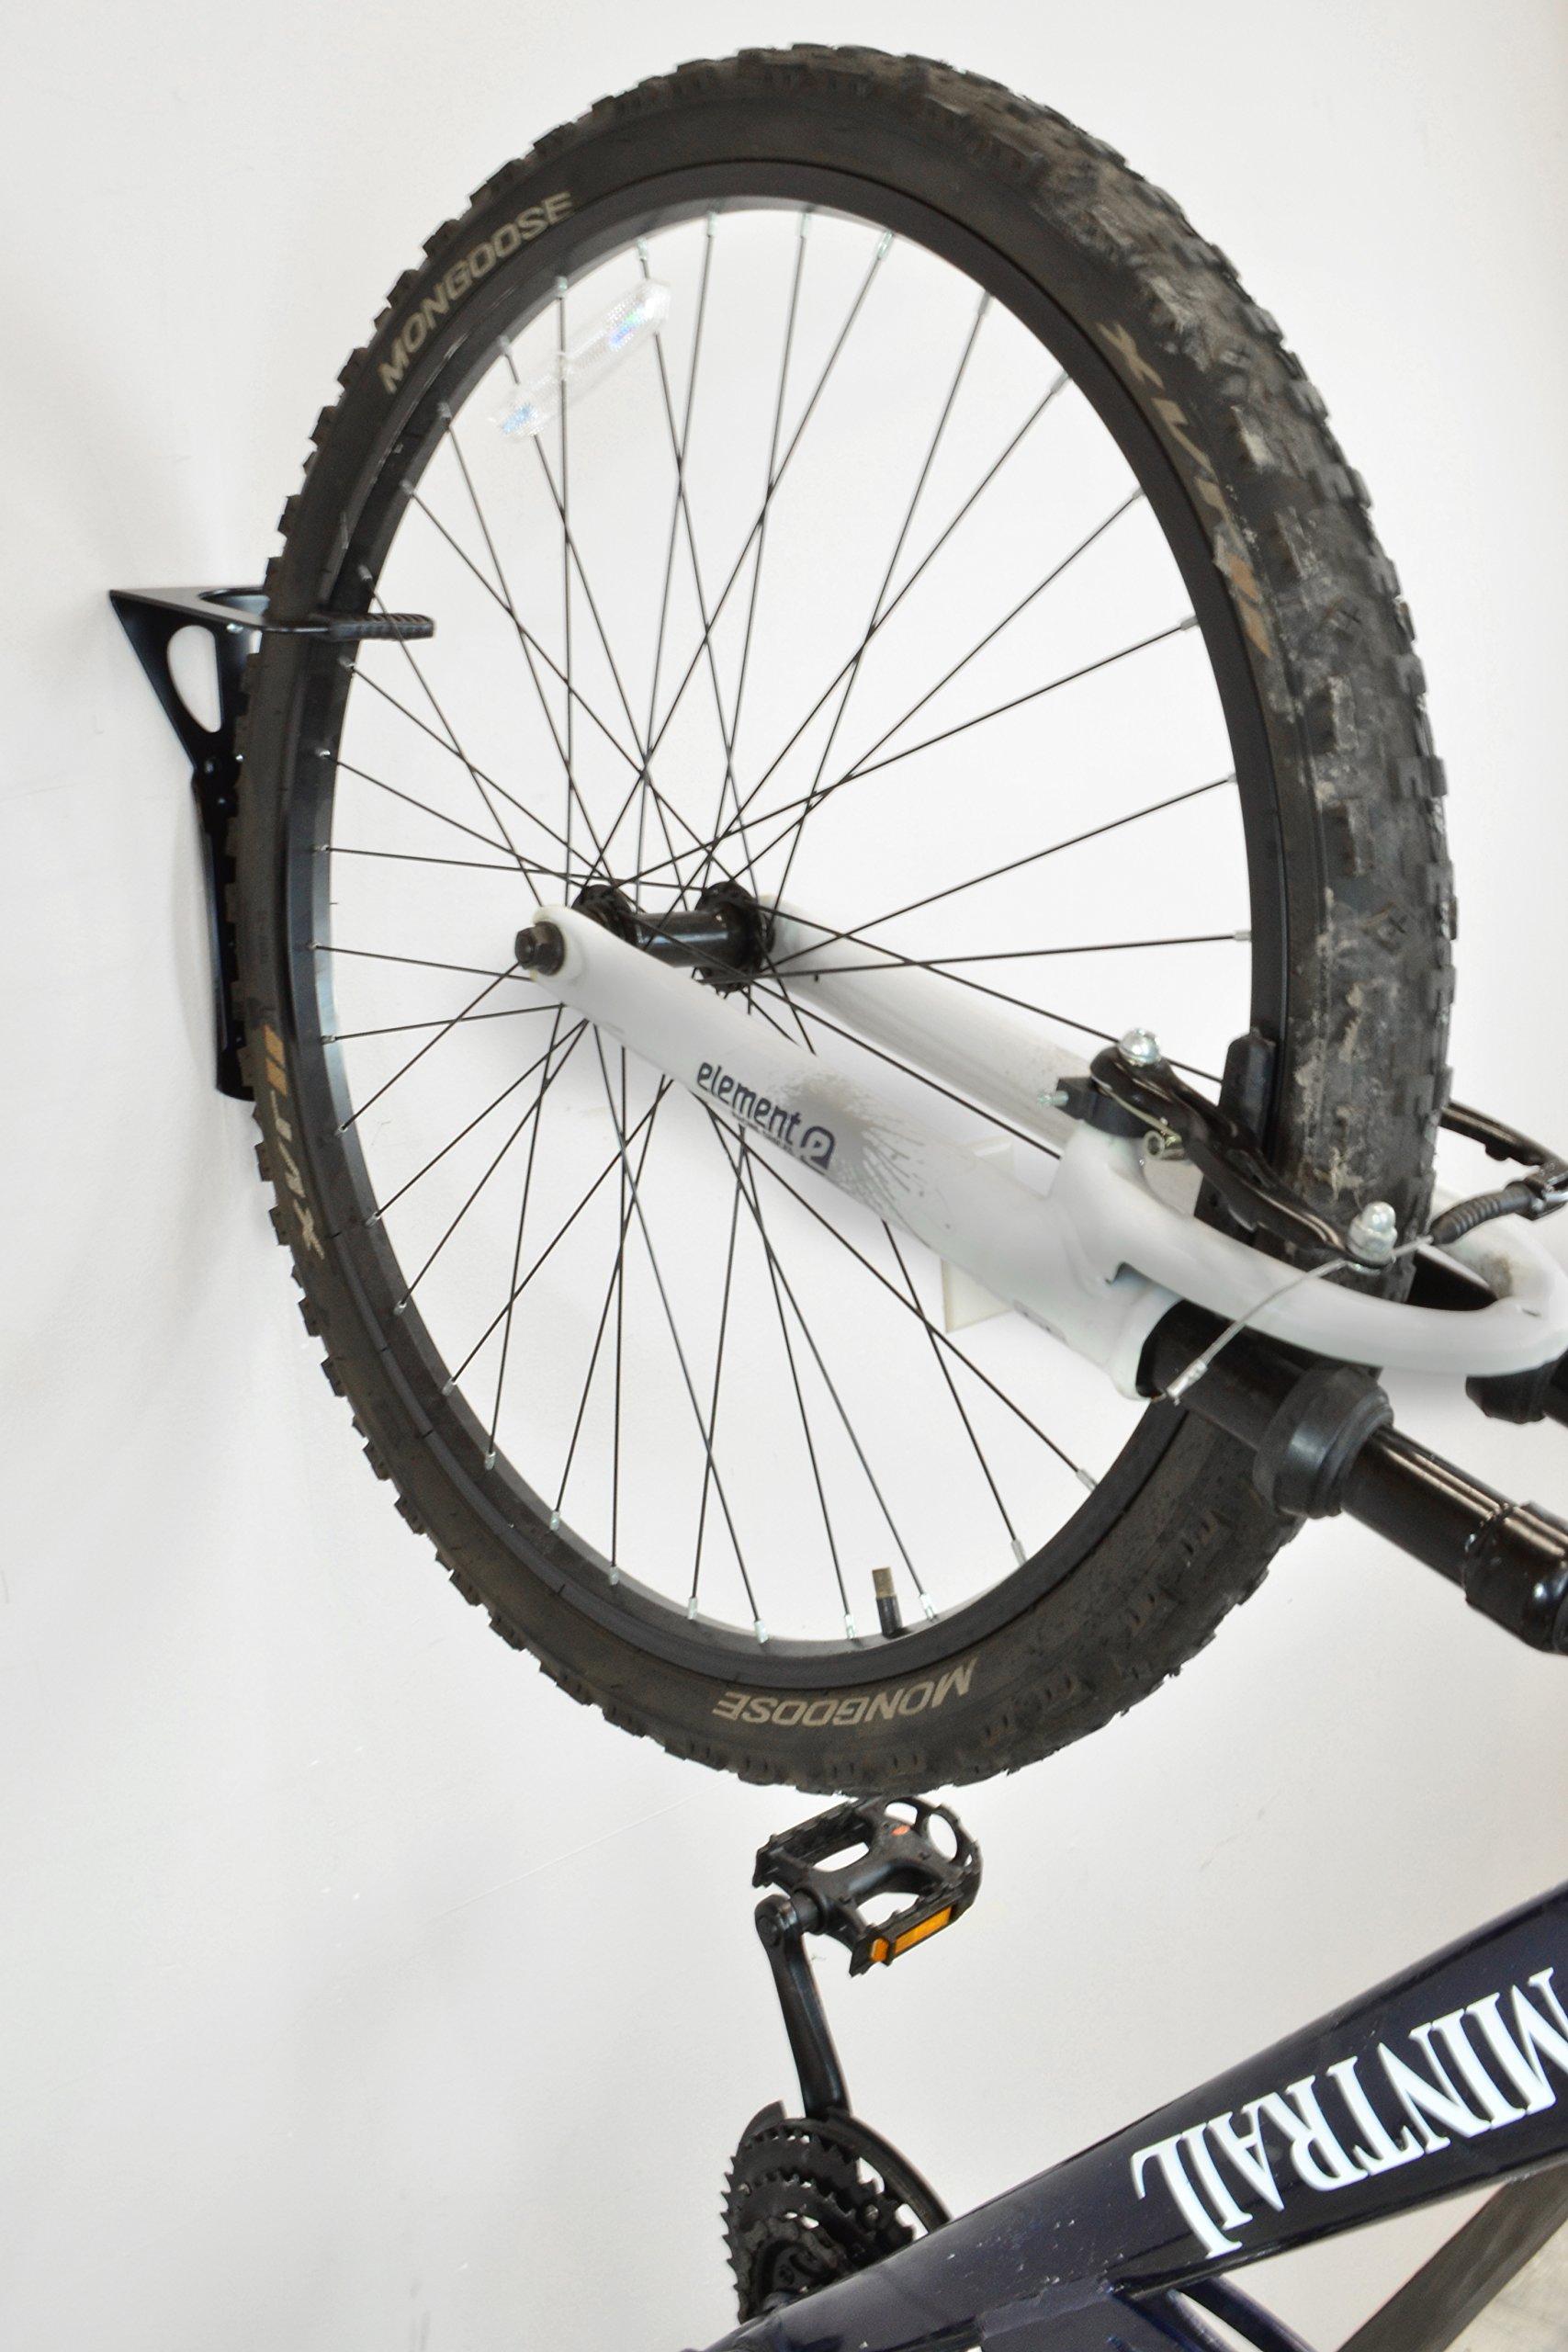 Lumintrail Heavy Duty Bicycle Wall Hanger Vertical Bike Storage Rack by Lumintrail (Image #6)